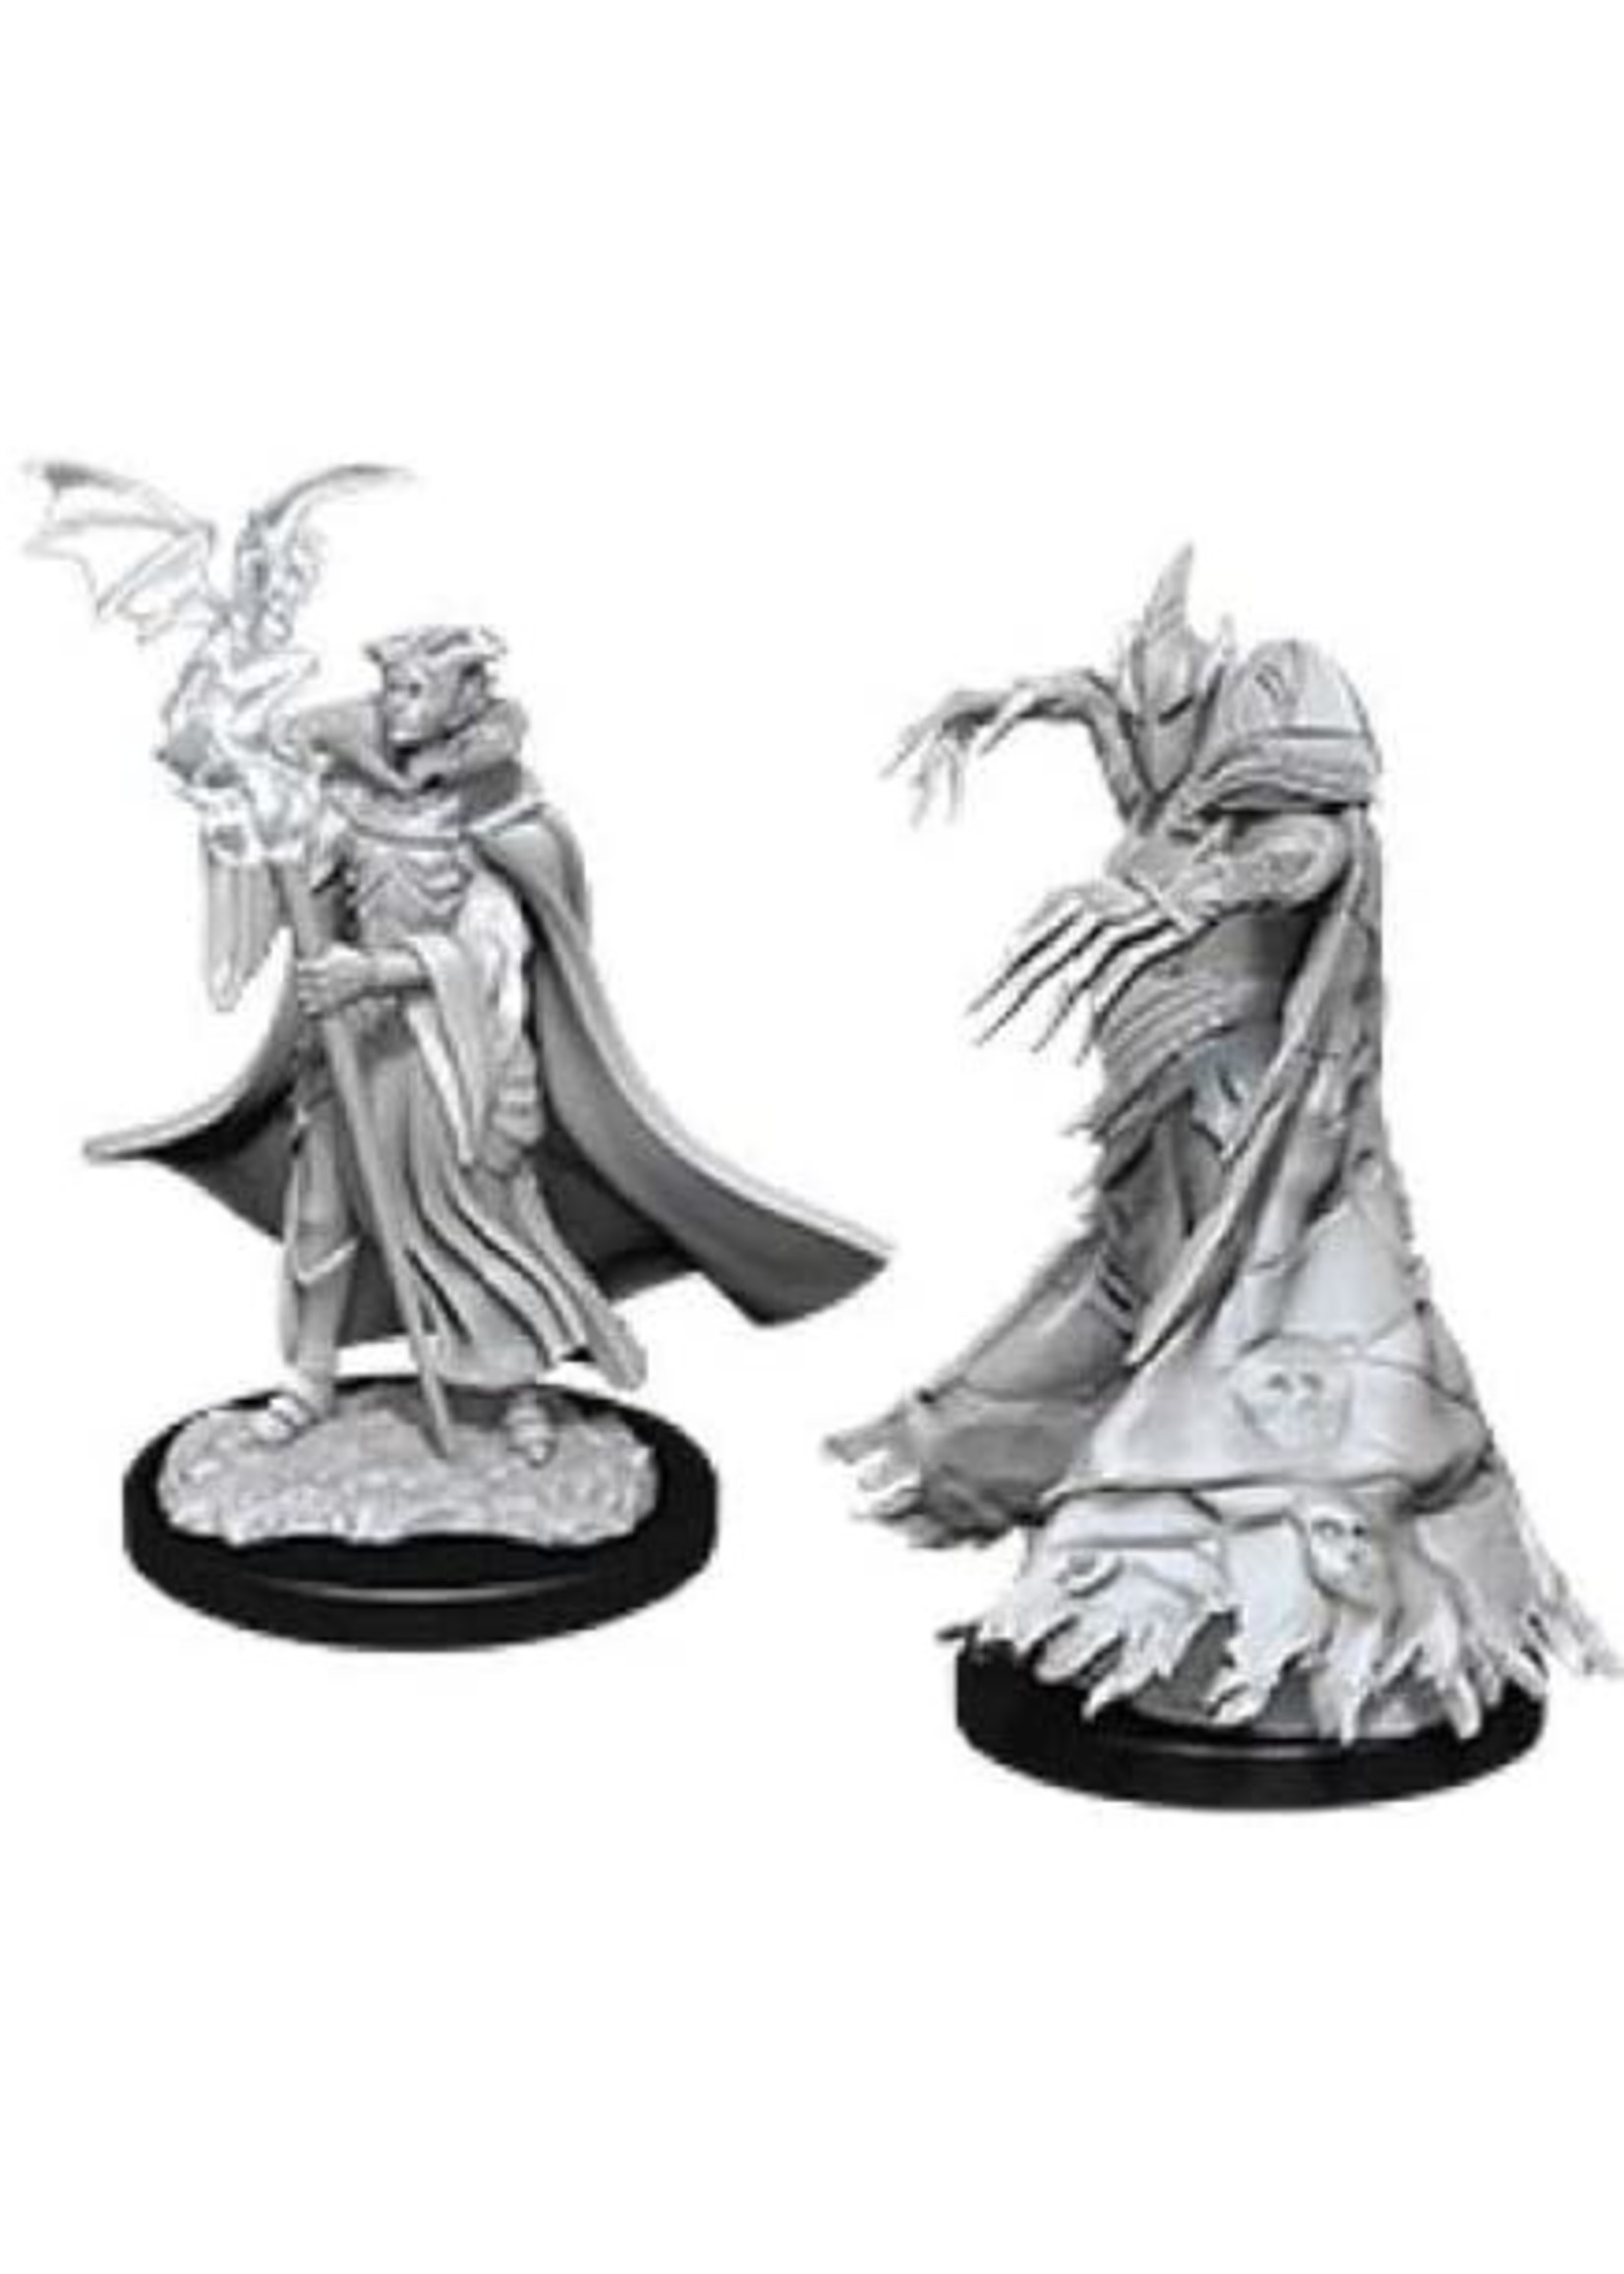 Pathfinder Deep Cuts Unpainted Miniatures: W12 Cultist & Devil